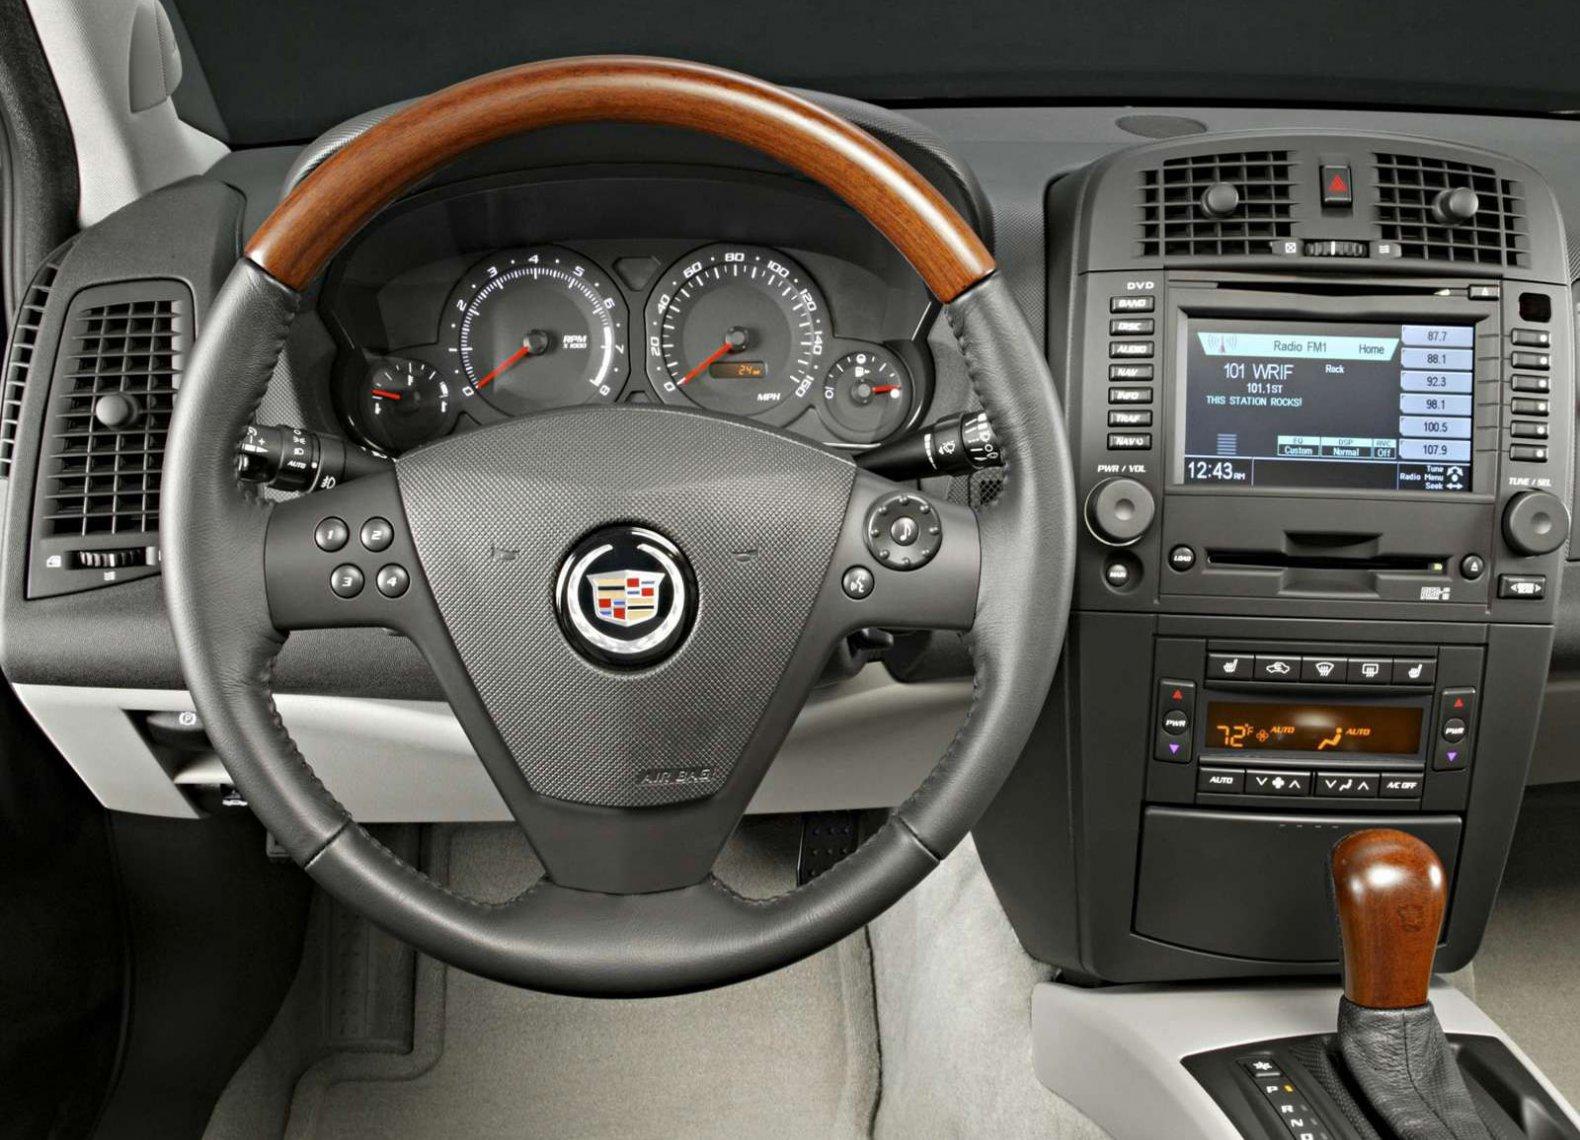 2009 Cadillac Cts Headlights at HeadlightsDepotcom Top